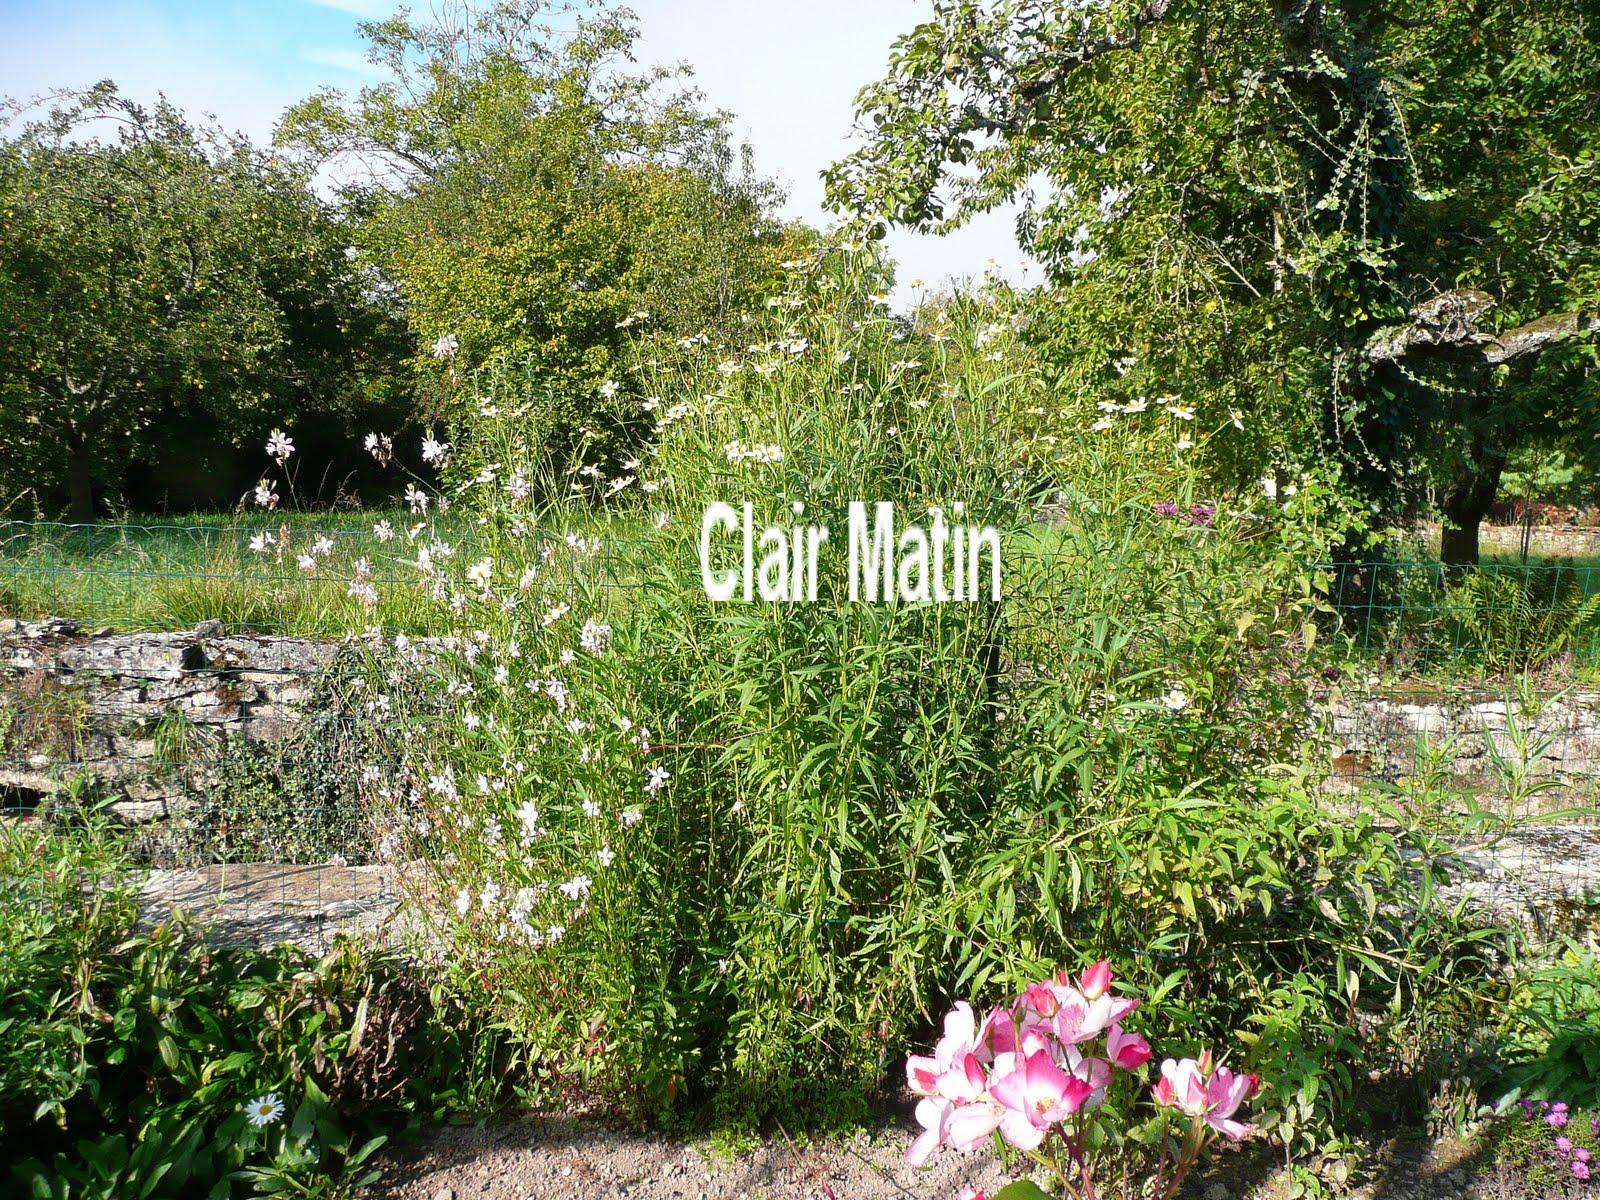 Notre jardin secret commande rosiers for M jardins miniac morvan